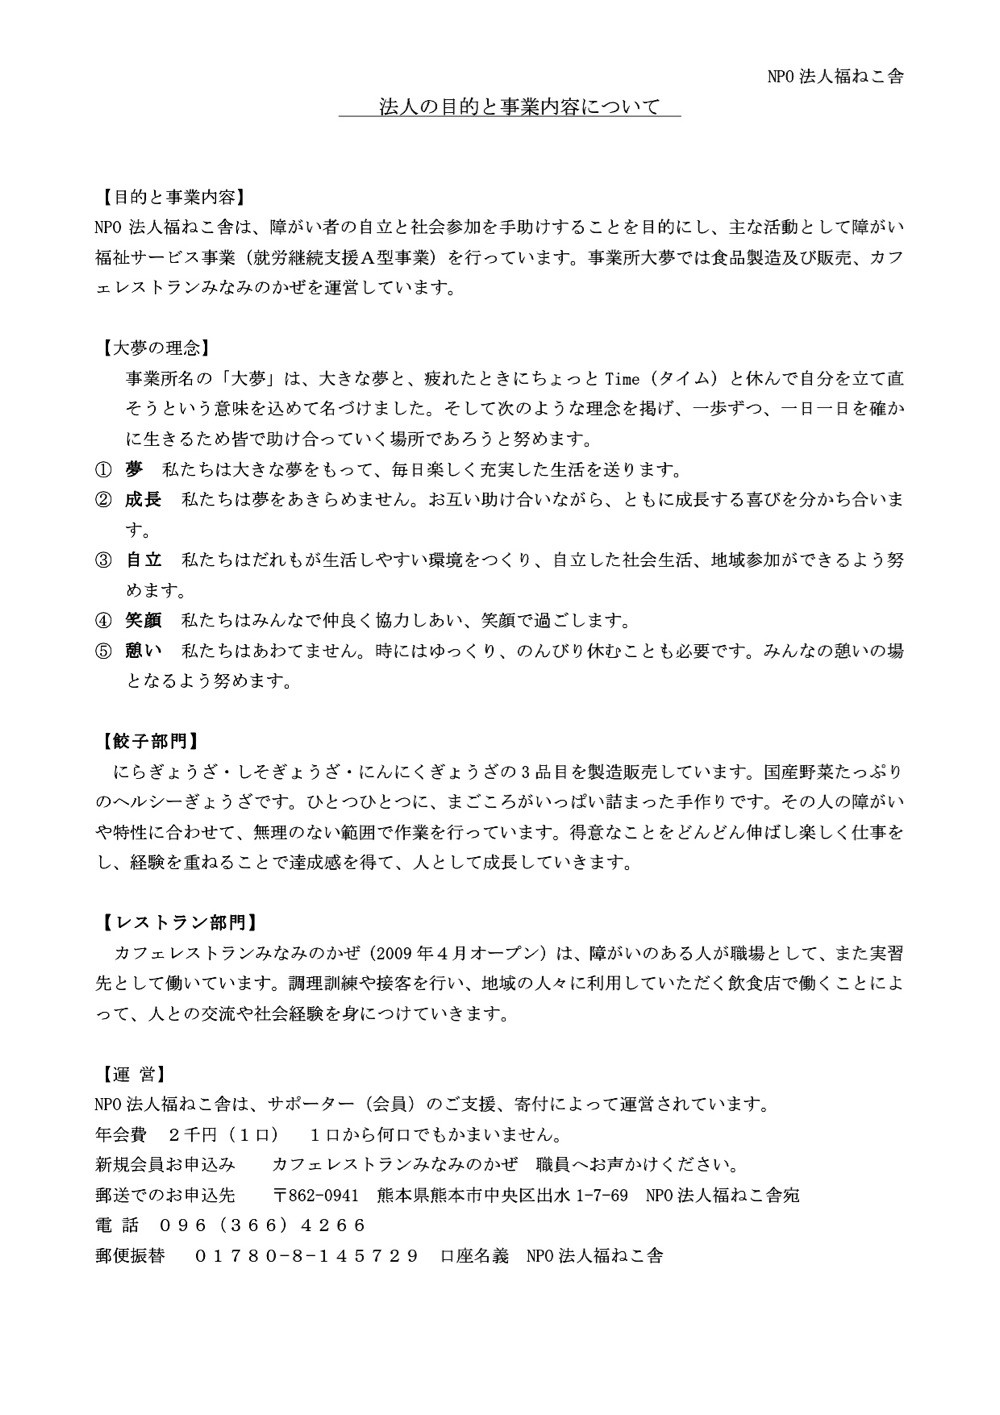 NPO法人福ねこ舎 理念と事業内容説明.jpg